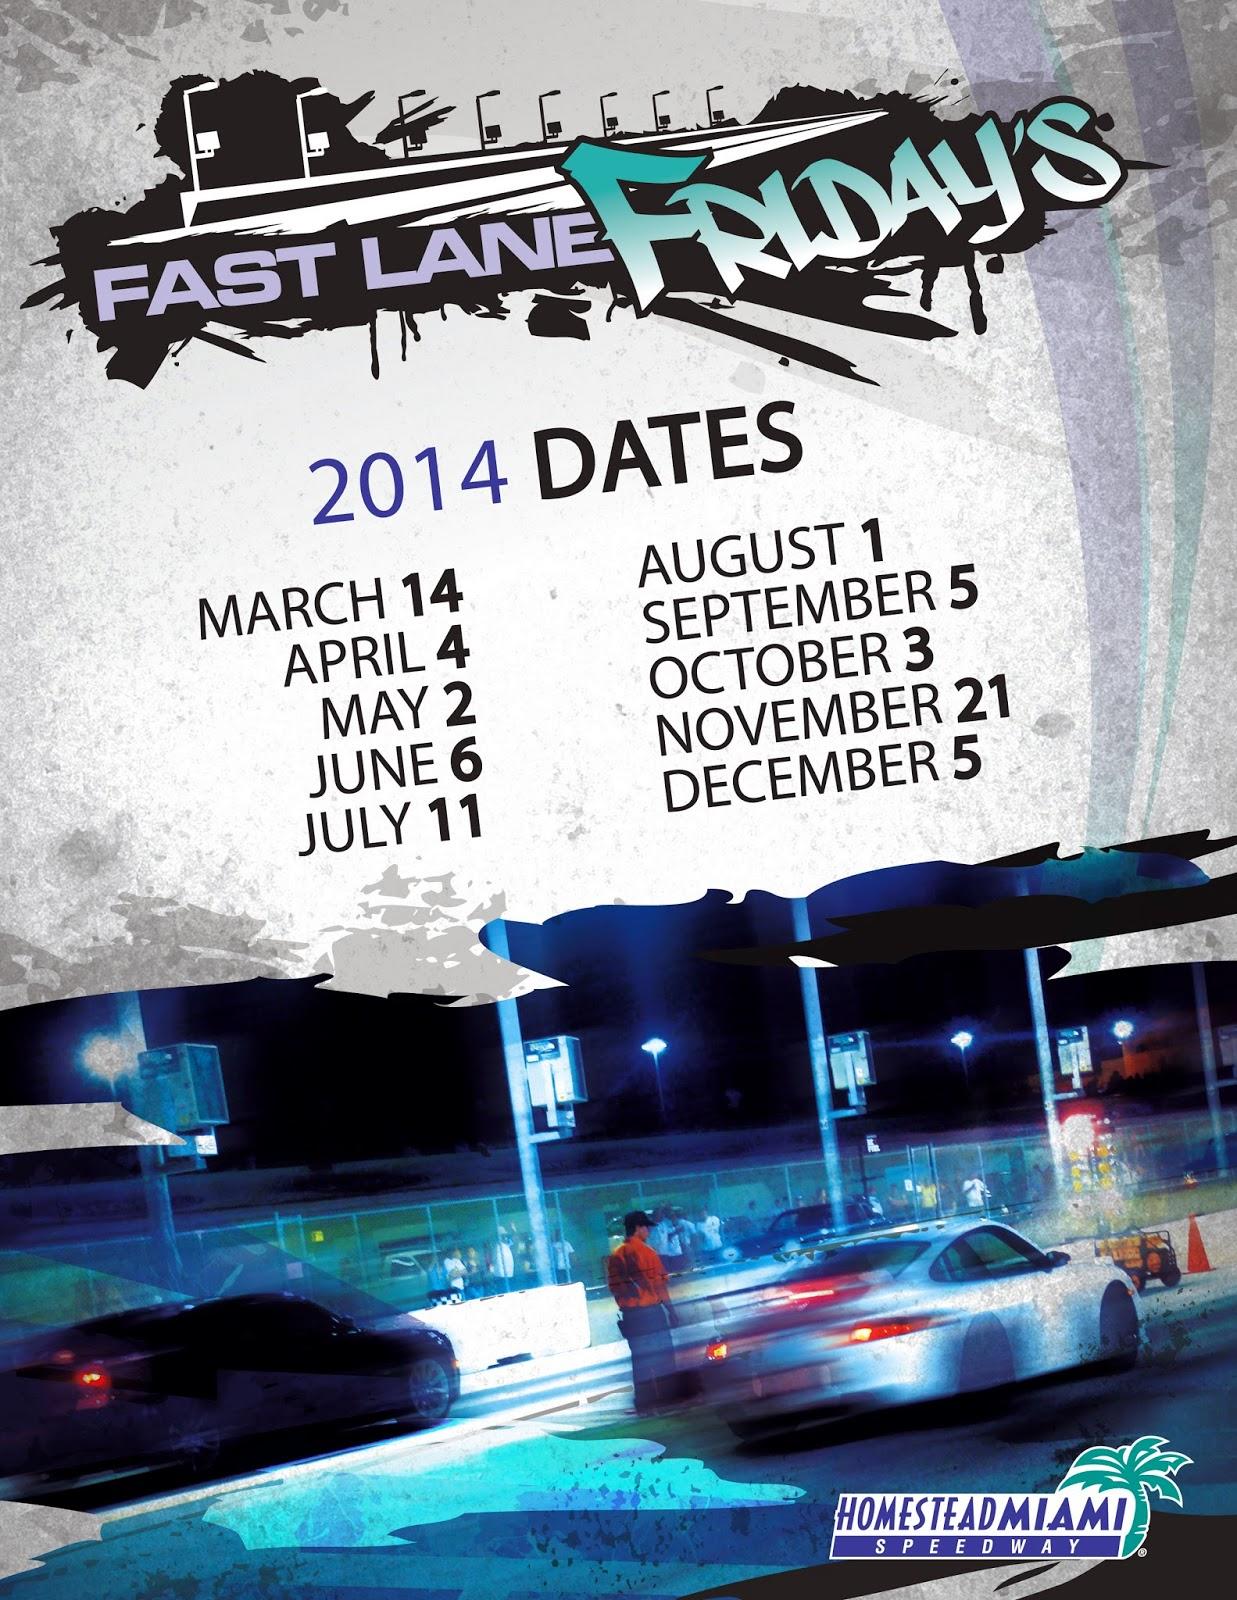 Fast Lane Fridays